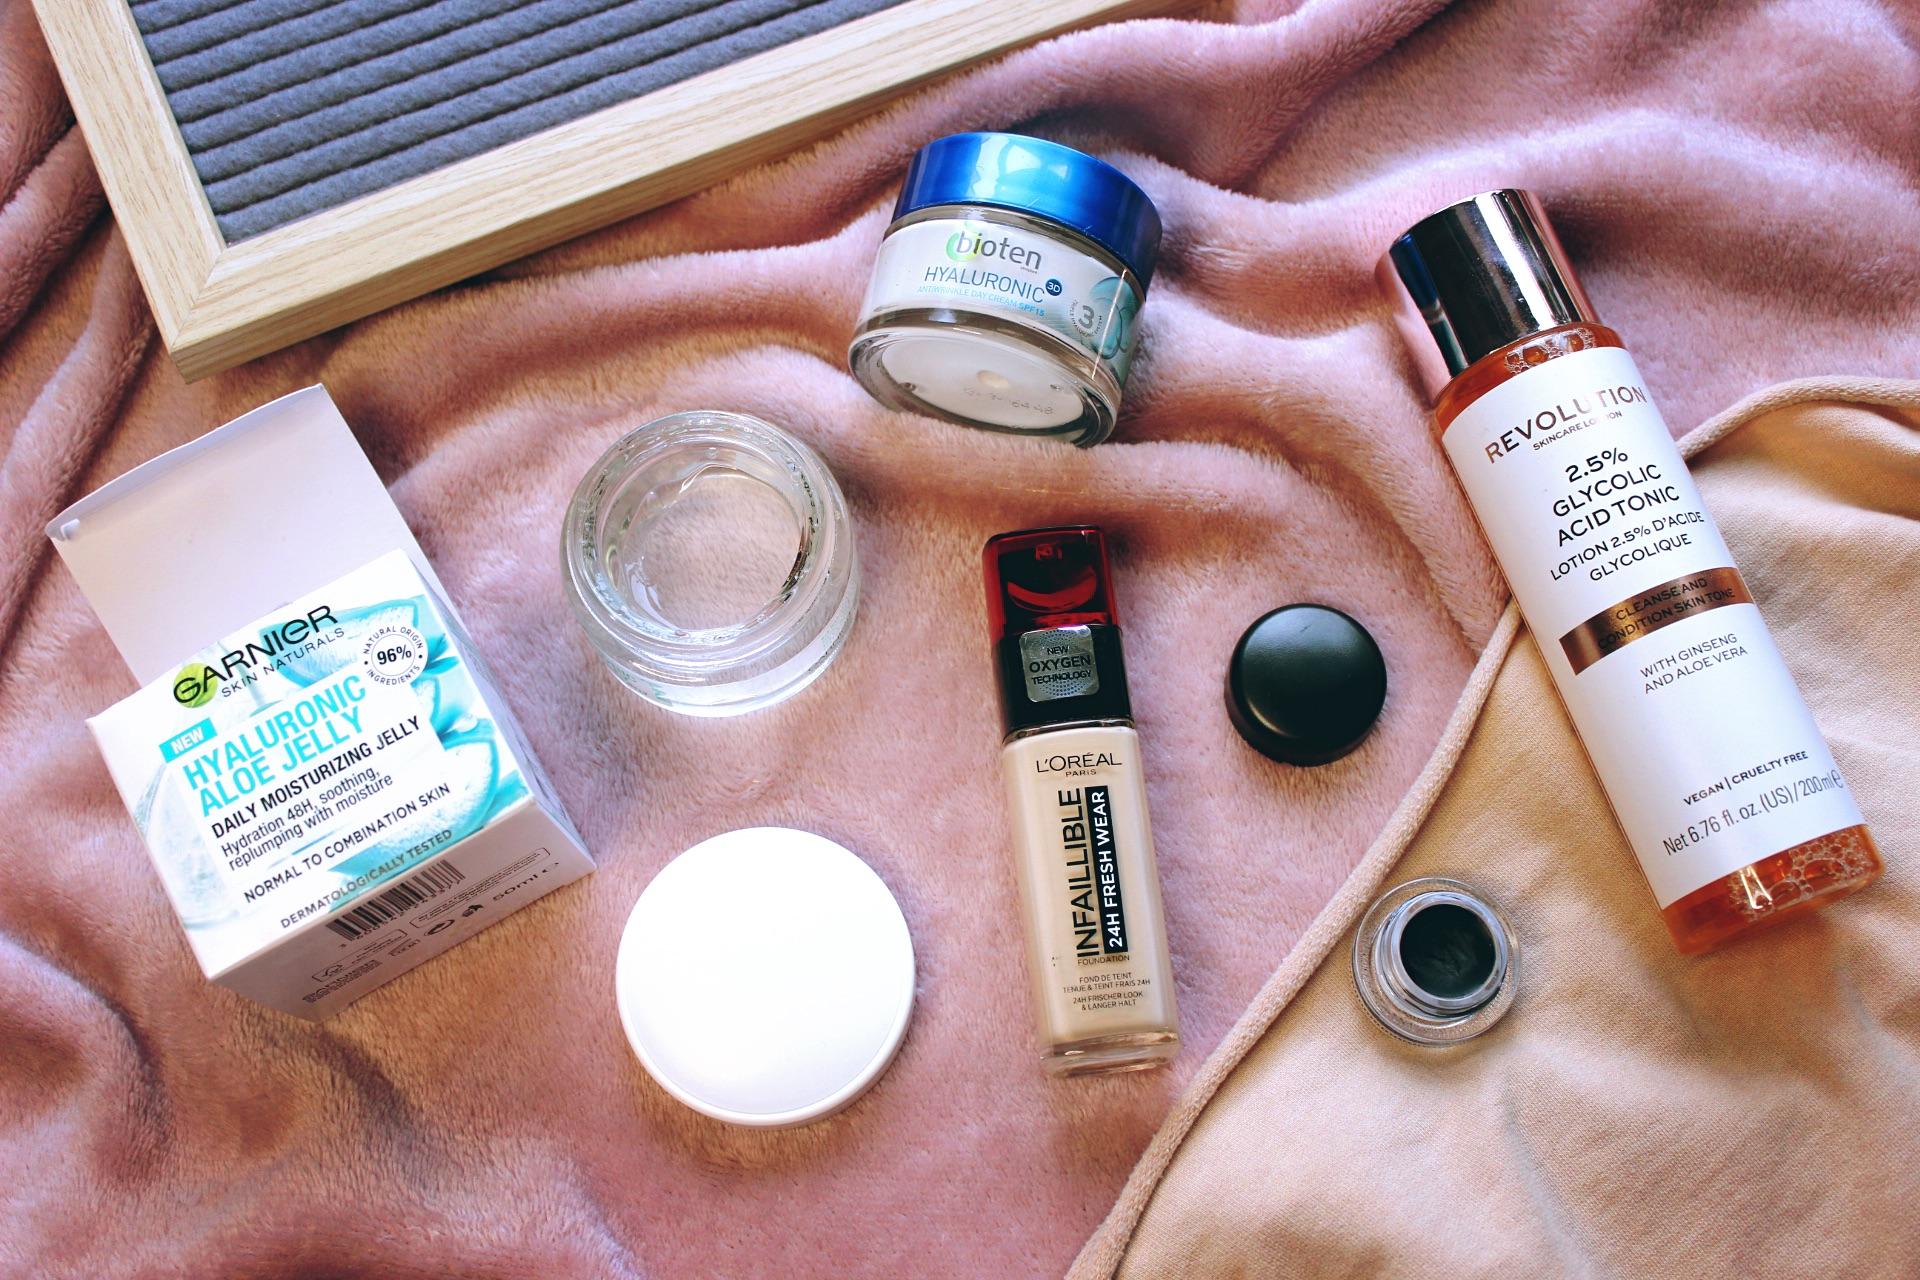 козметични продукти мнение ревю MAC Fluidline очна линия, гел за лице Garnier, Bioten Hyaluronic крем за лице, фон дьо тен L'oreal Infaillible